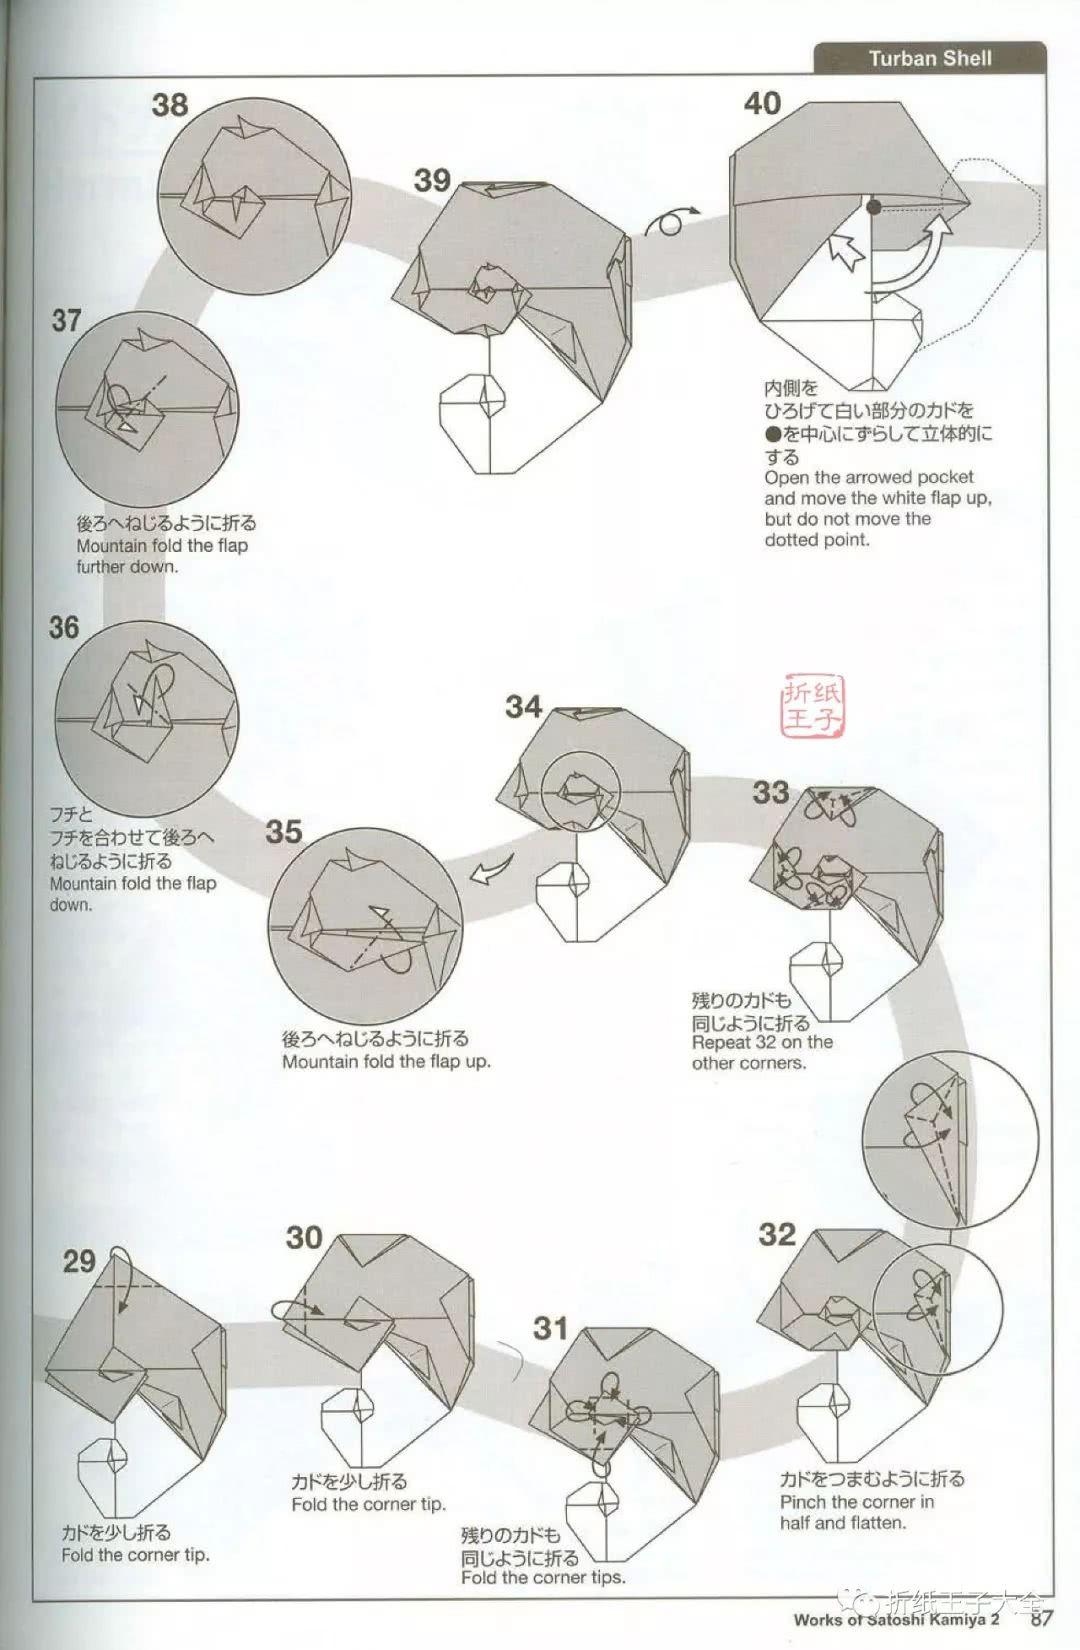 神谷哲史海螺折纸图解,turban shell